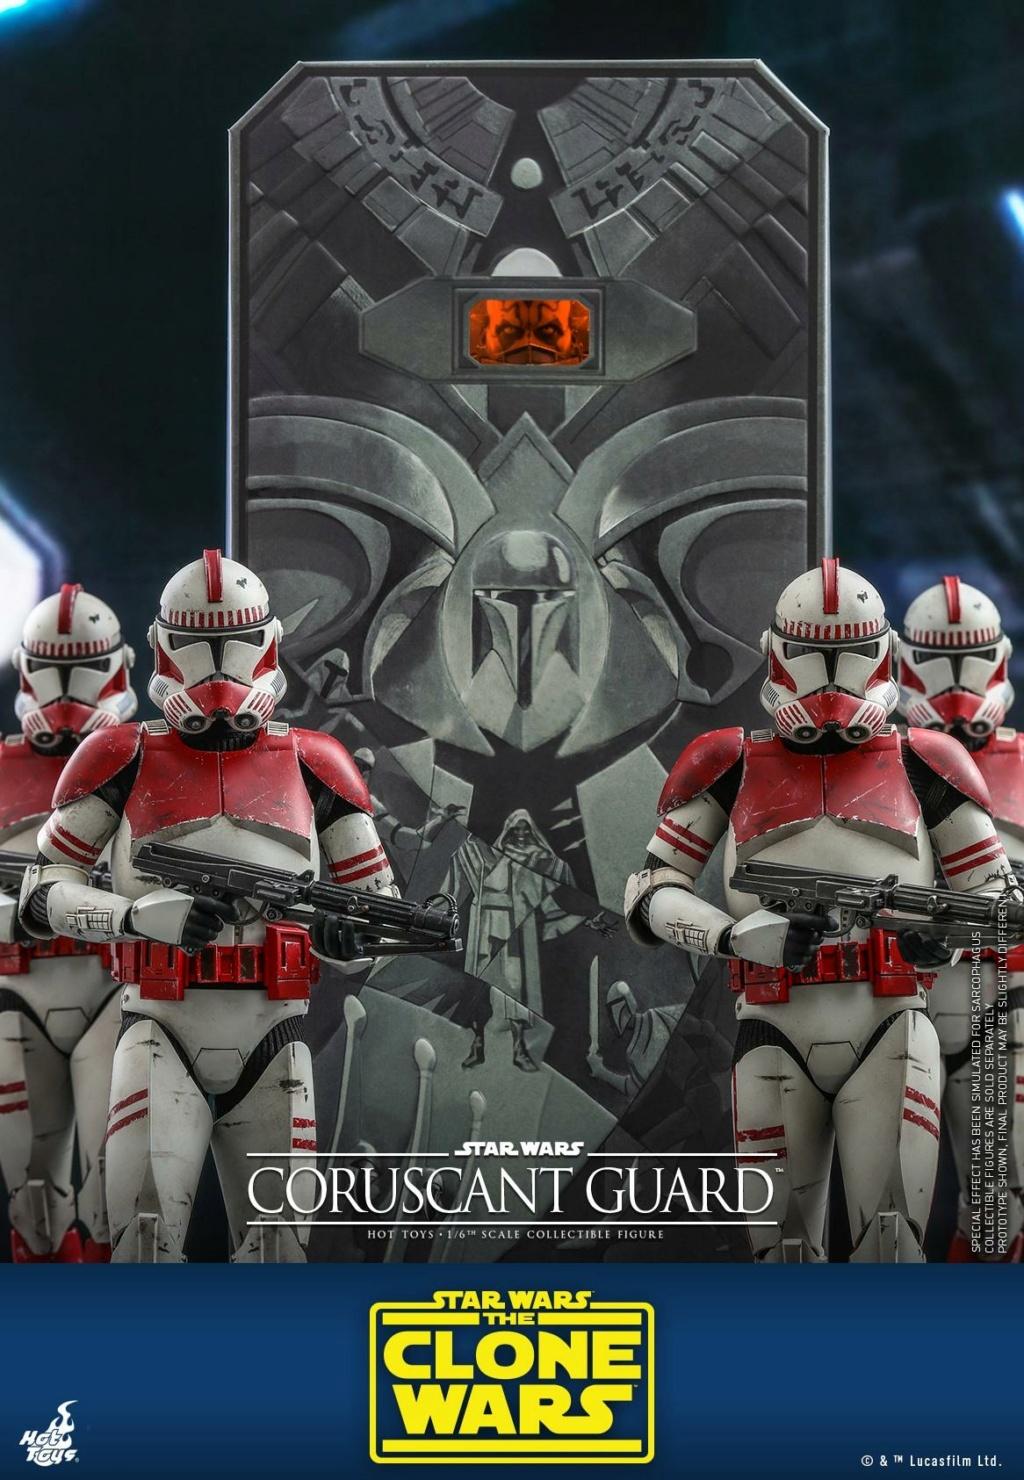 Coruscant Guard - 1/6th Figure - The Clone Wars - Hot Toys Corusc15